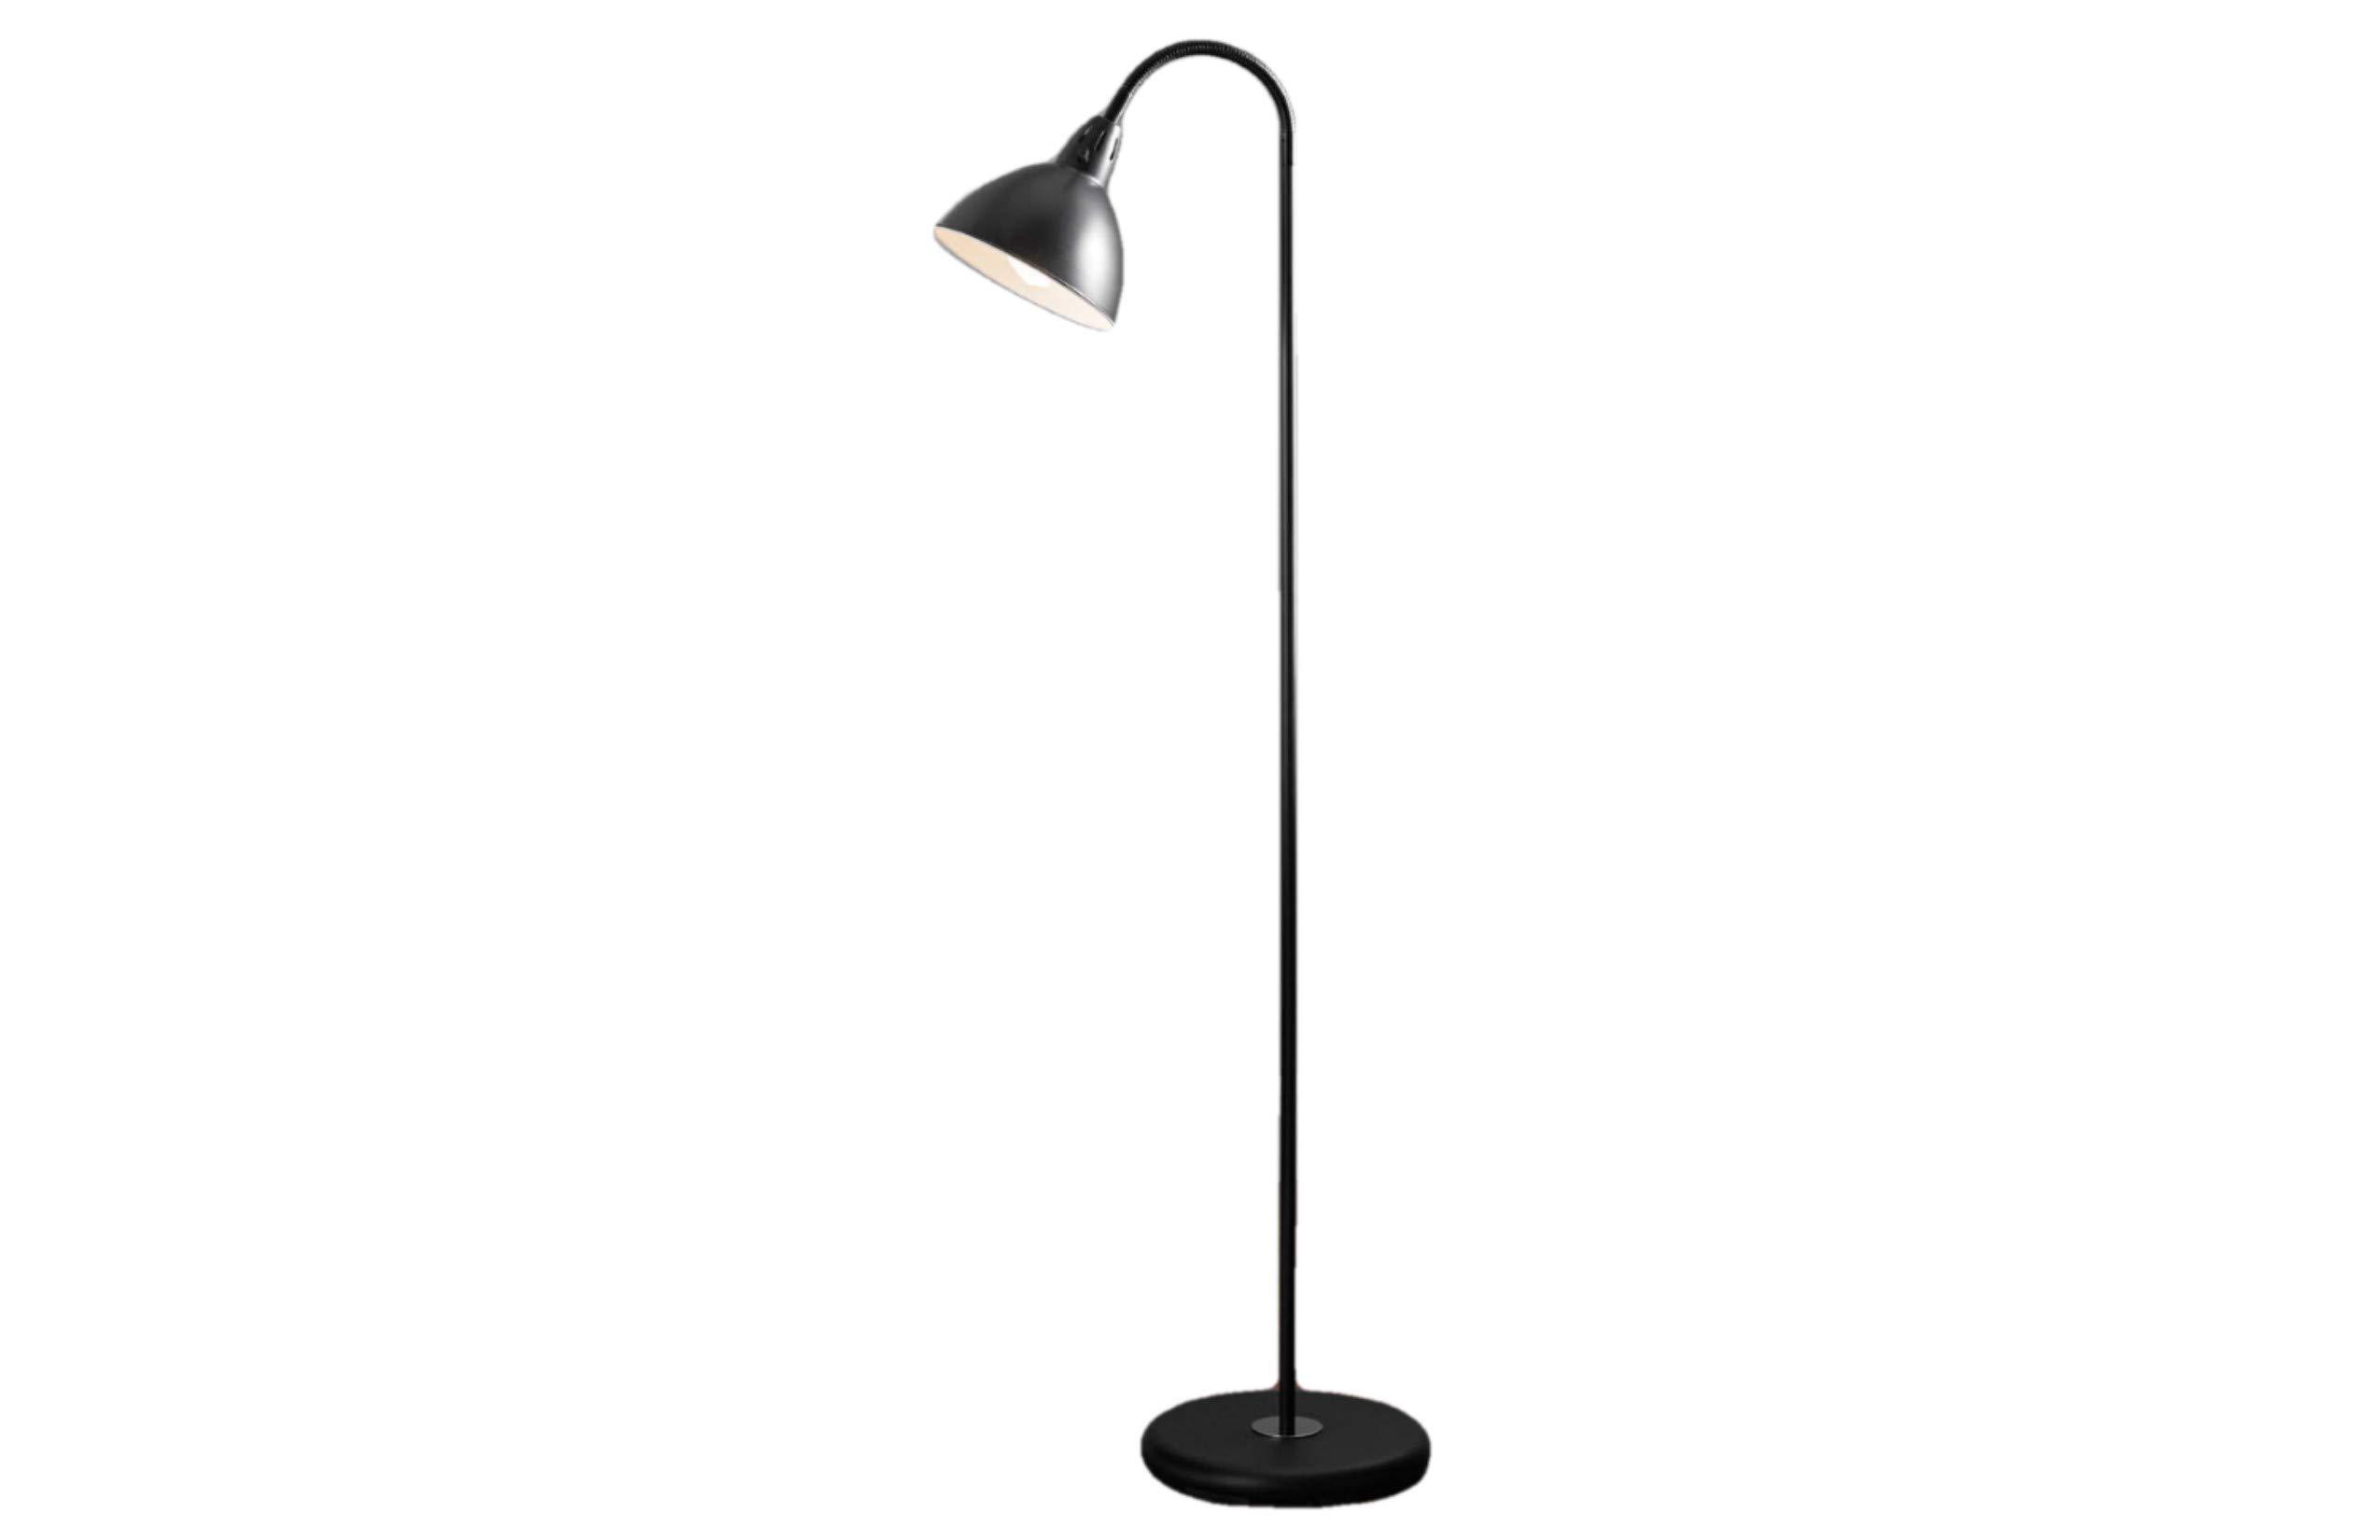 Mainstays Gooseneck Floor Lamp (Black) -  - living-room-decor, living-room, floor-lamps - 61FP43LbUJL -